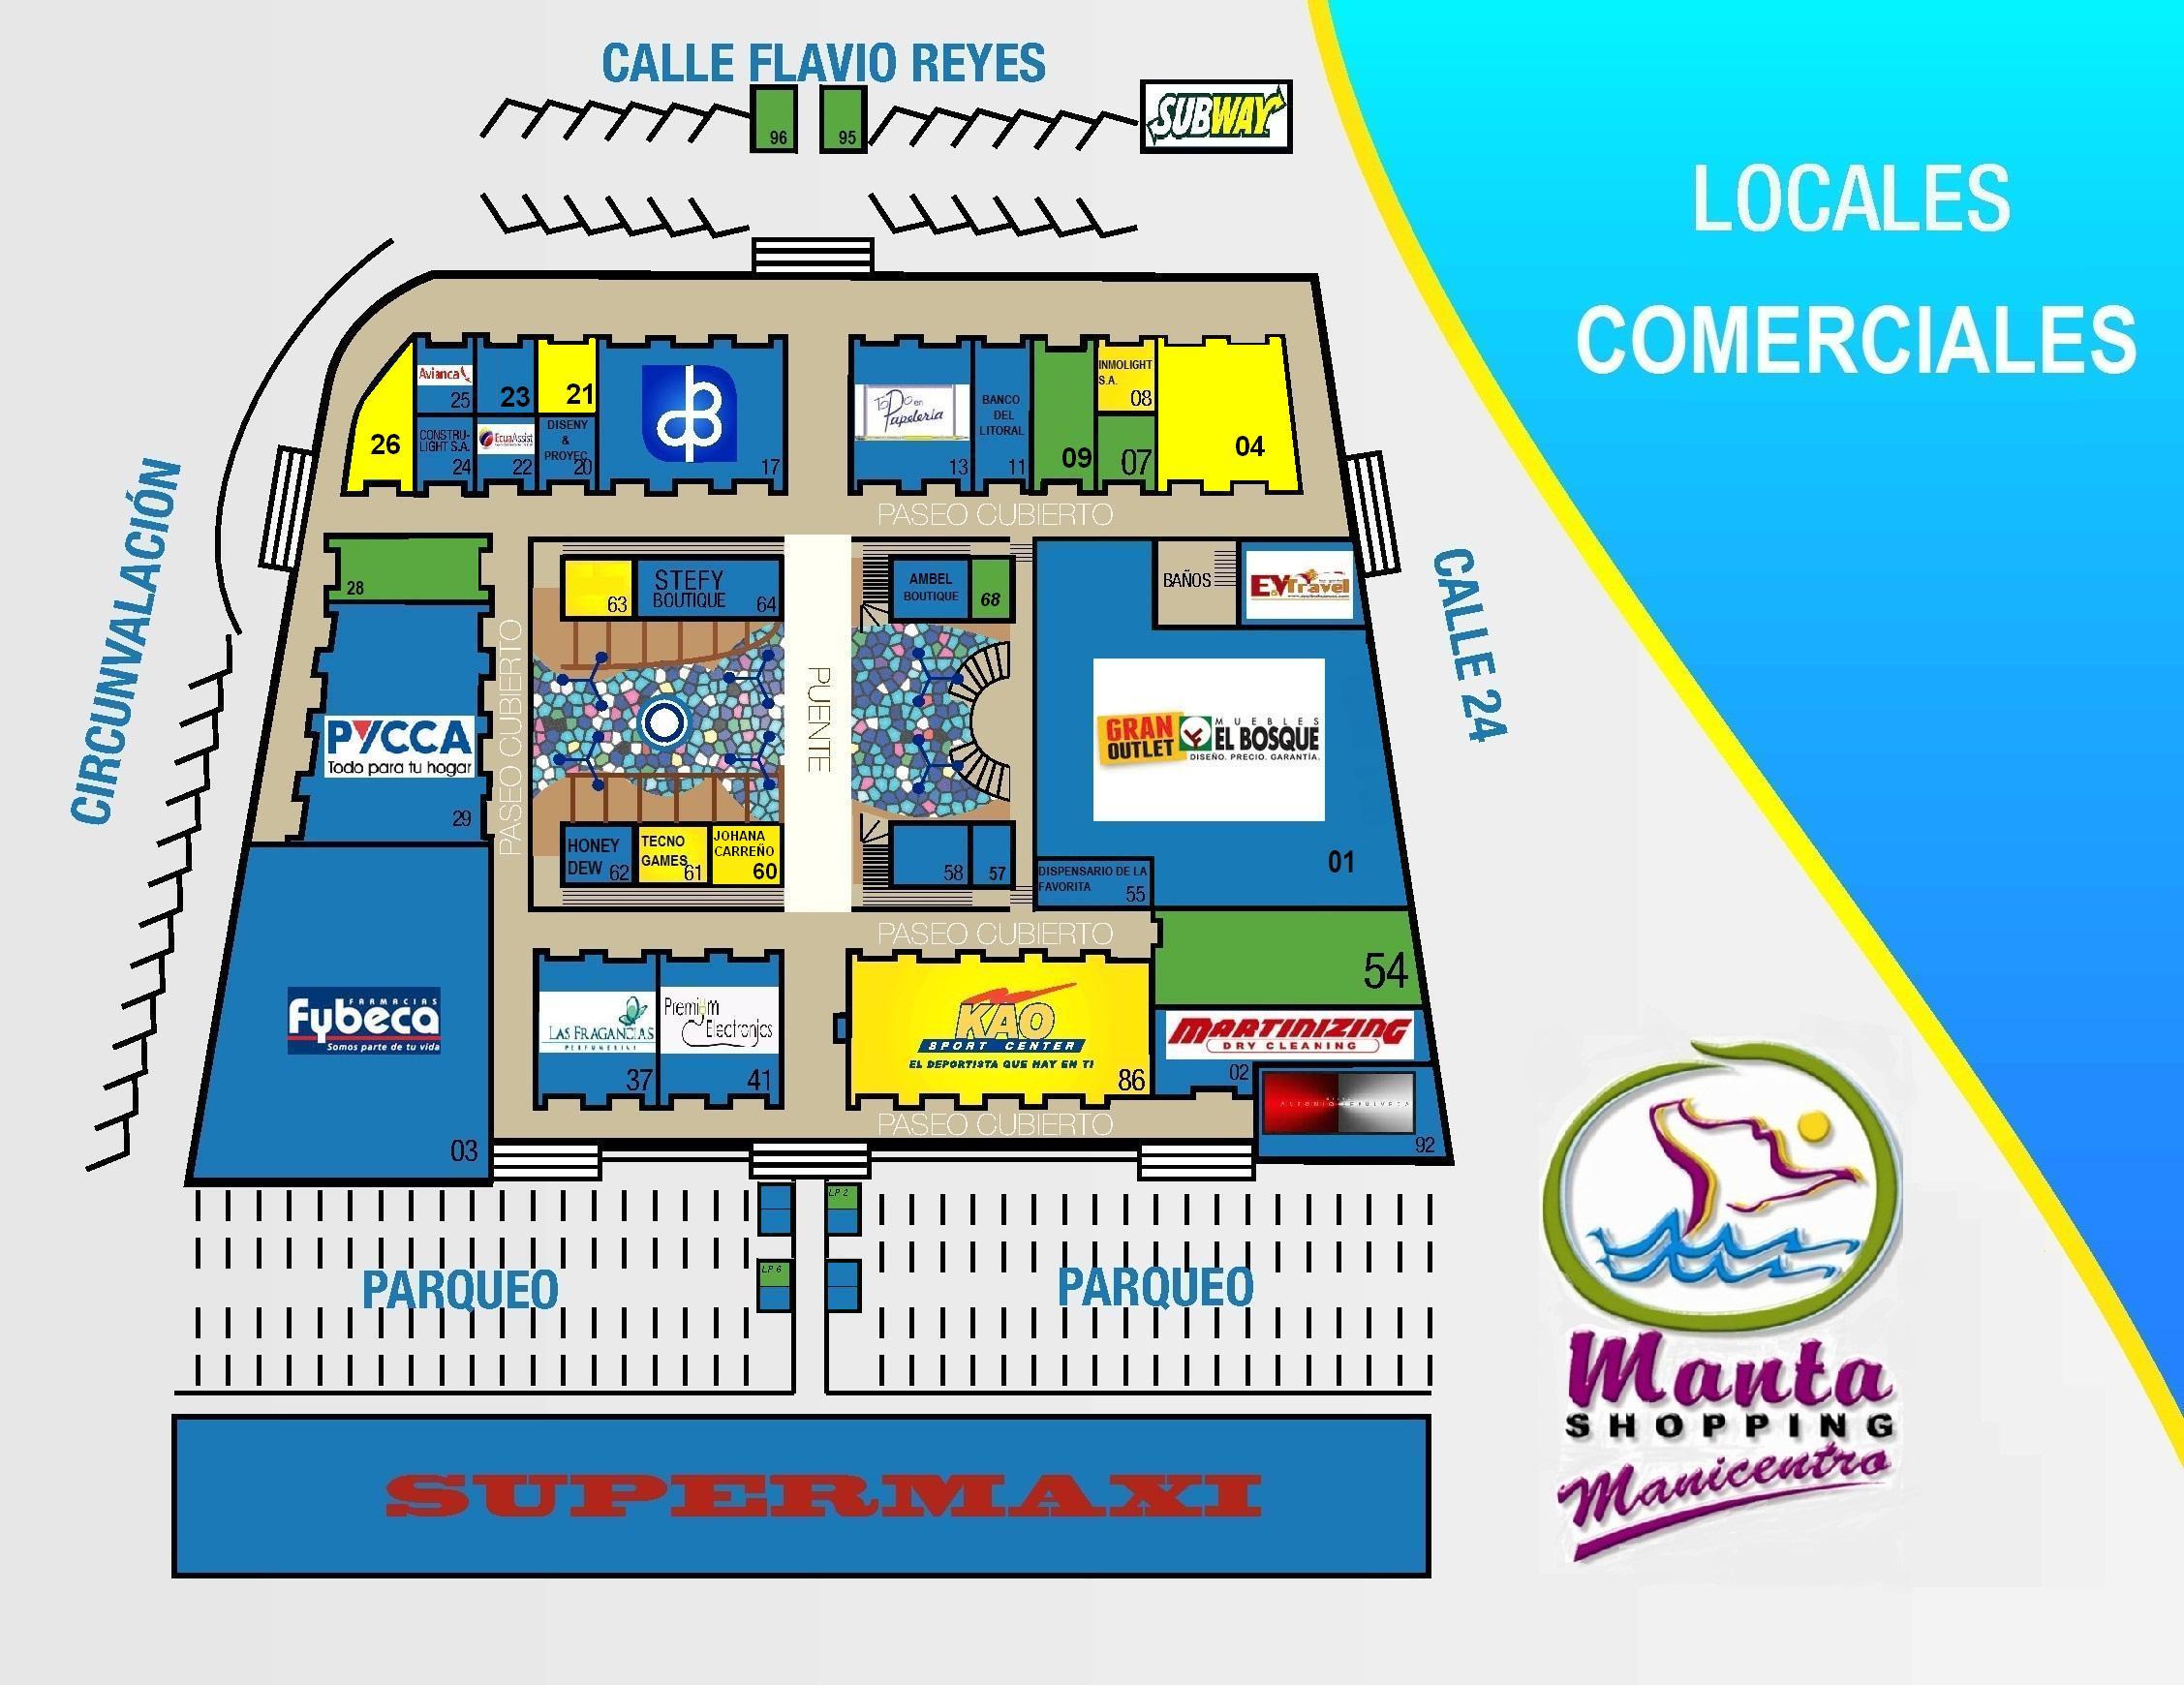 MANICENTRO, Manta Shopping